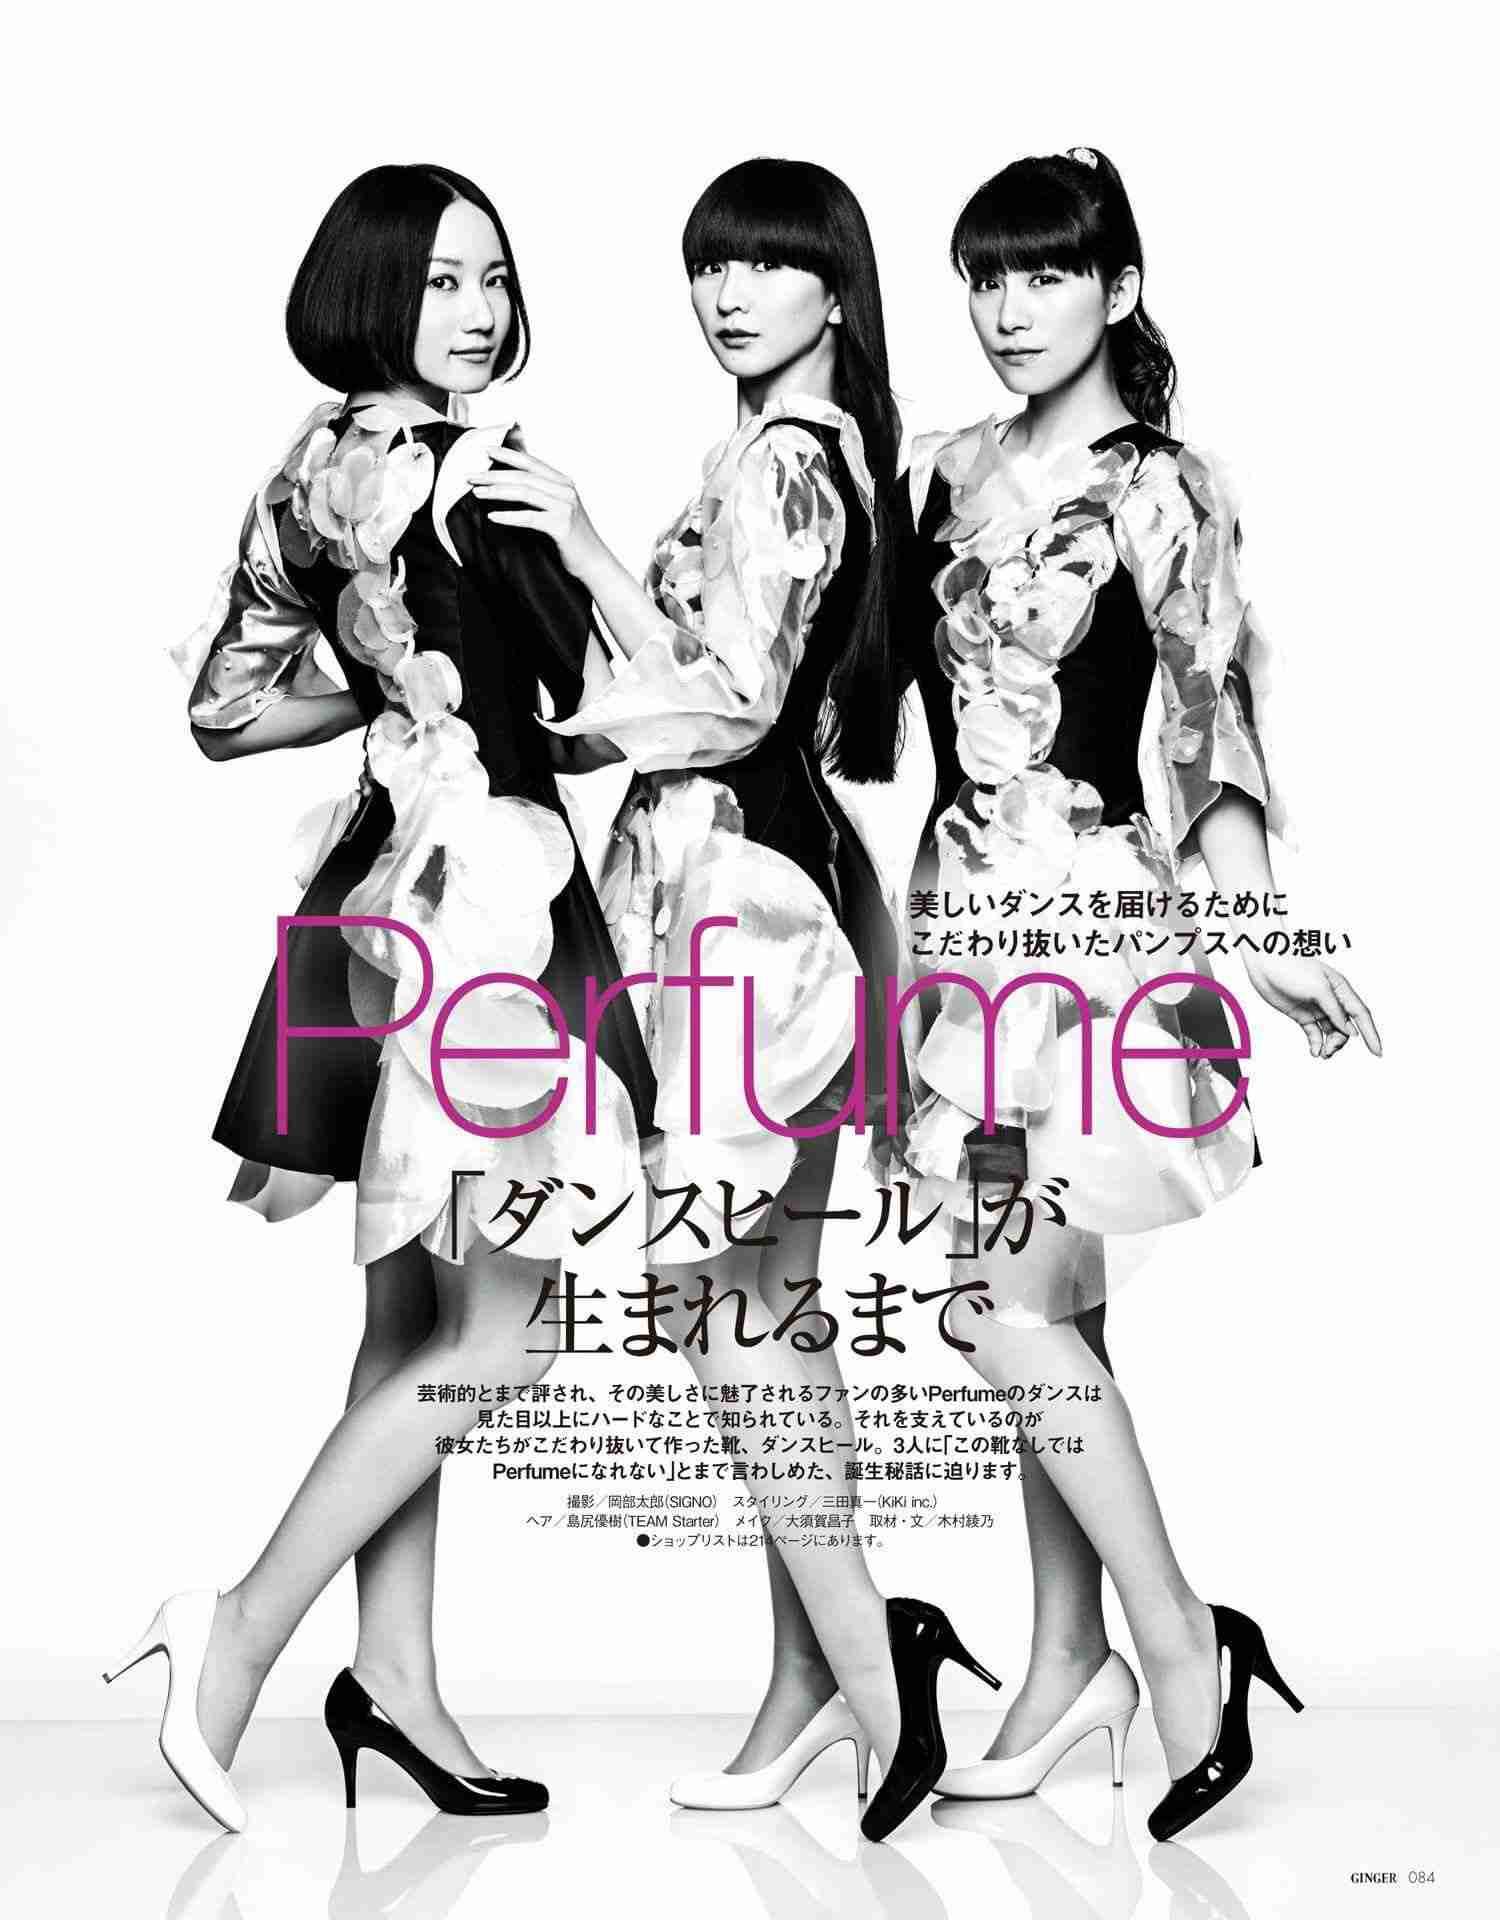 Perfumeについて語るトピPart2